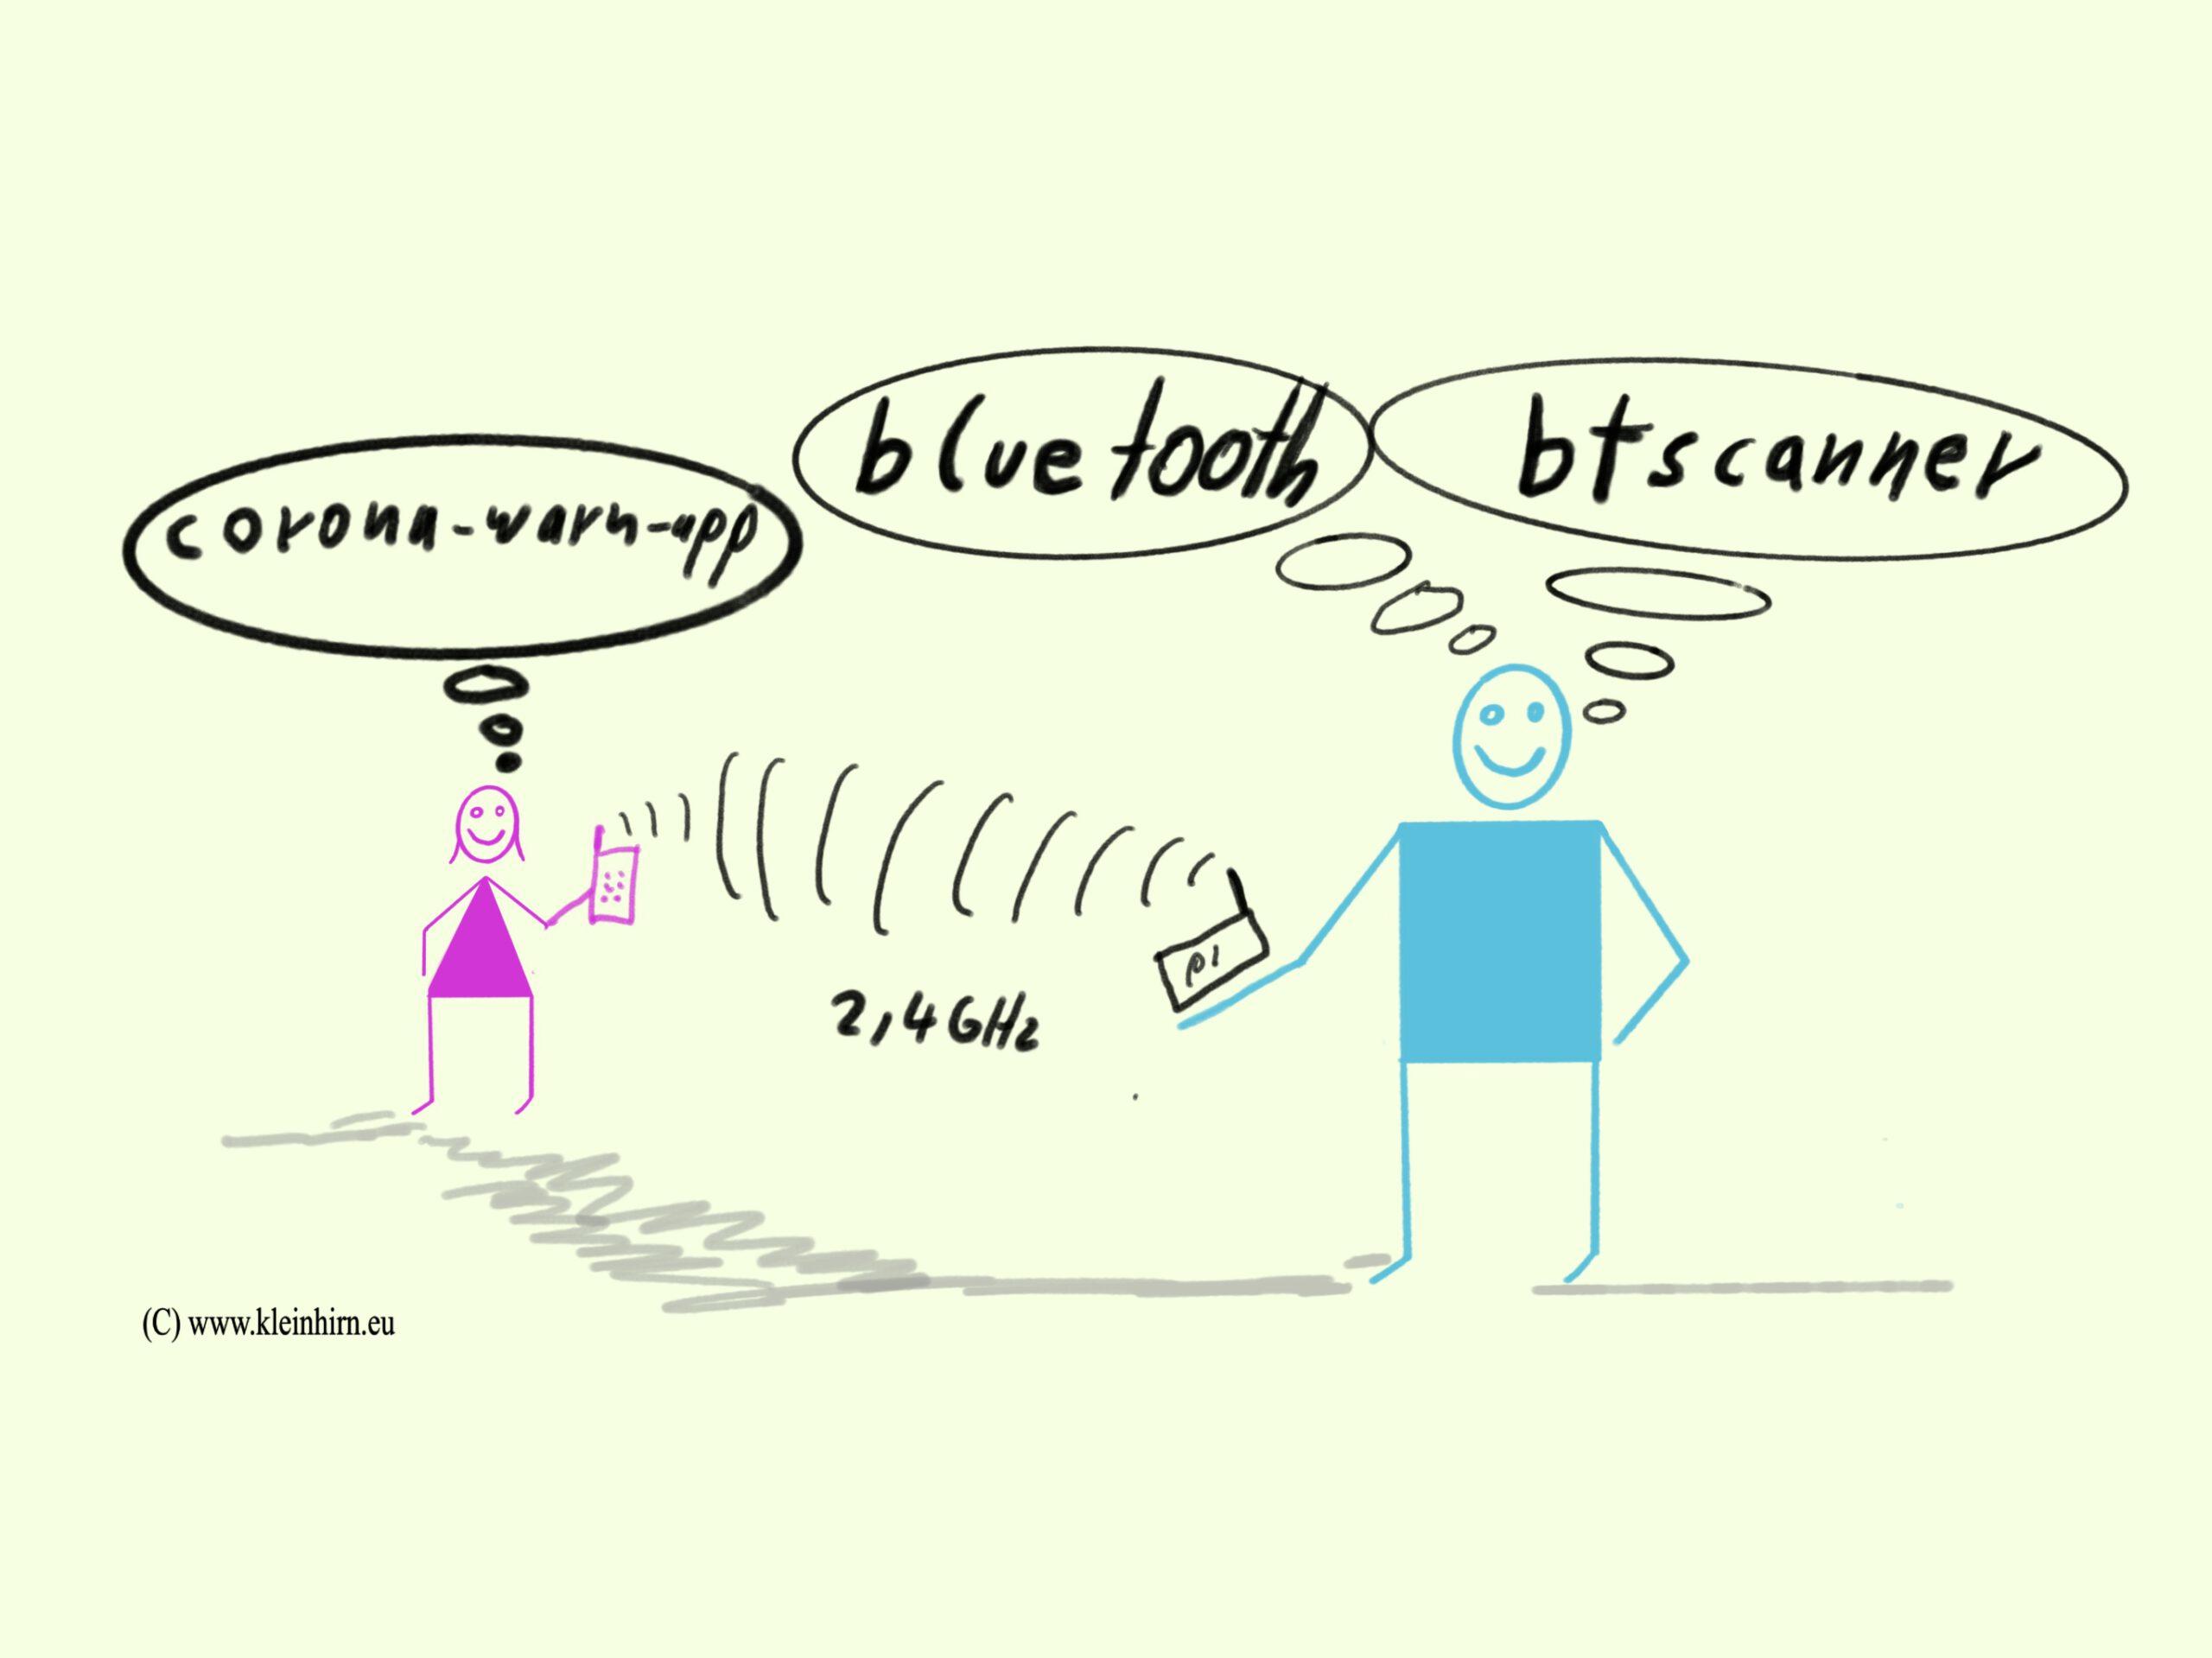 Btscanner